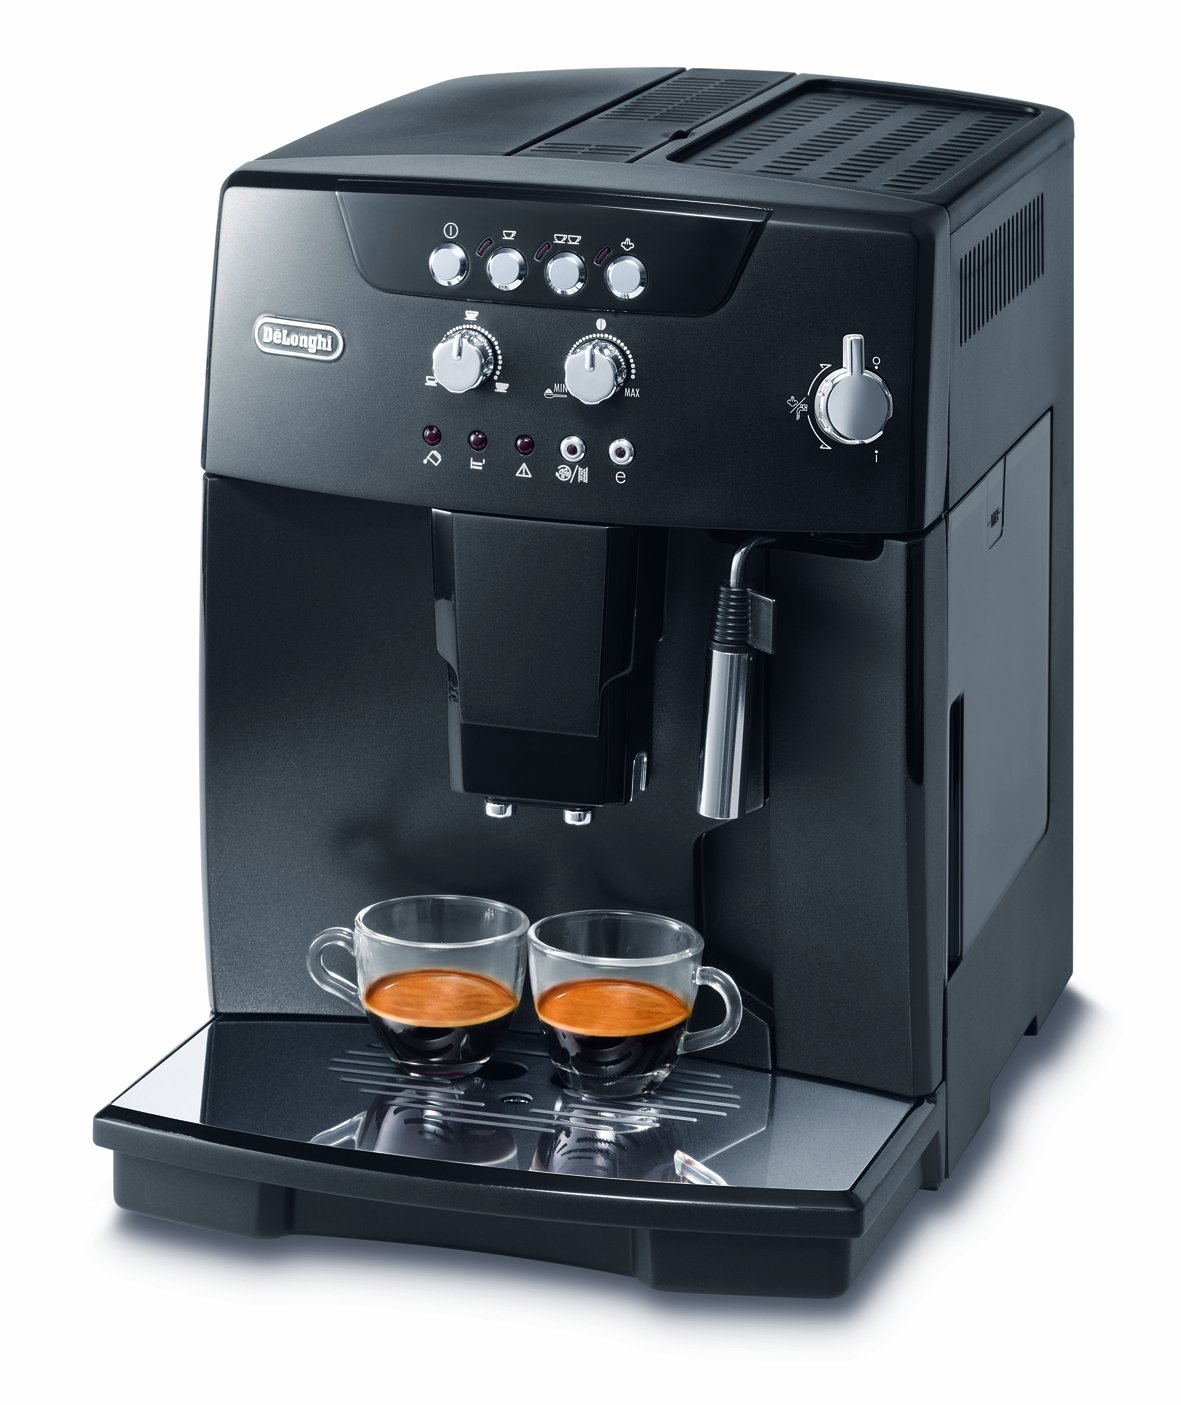 DeLonghi ECAM 04.110 B KaffeeVollautomat Magnifica III (1.8 l, 15 bar, Dampfdüse) schwarzÜberprüfung und weitere Informationen